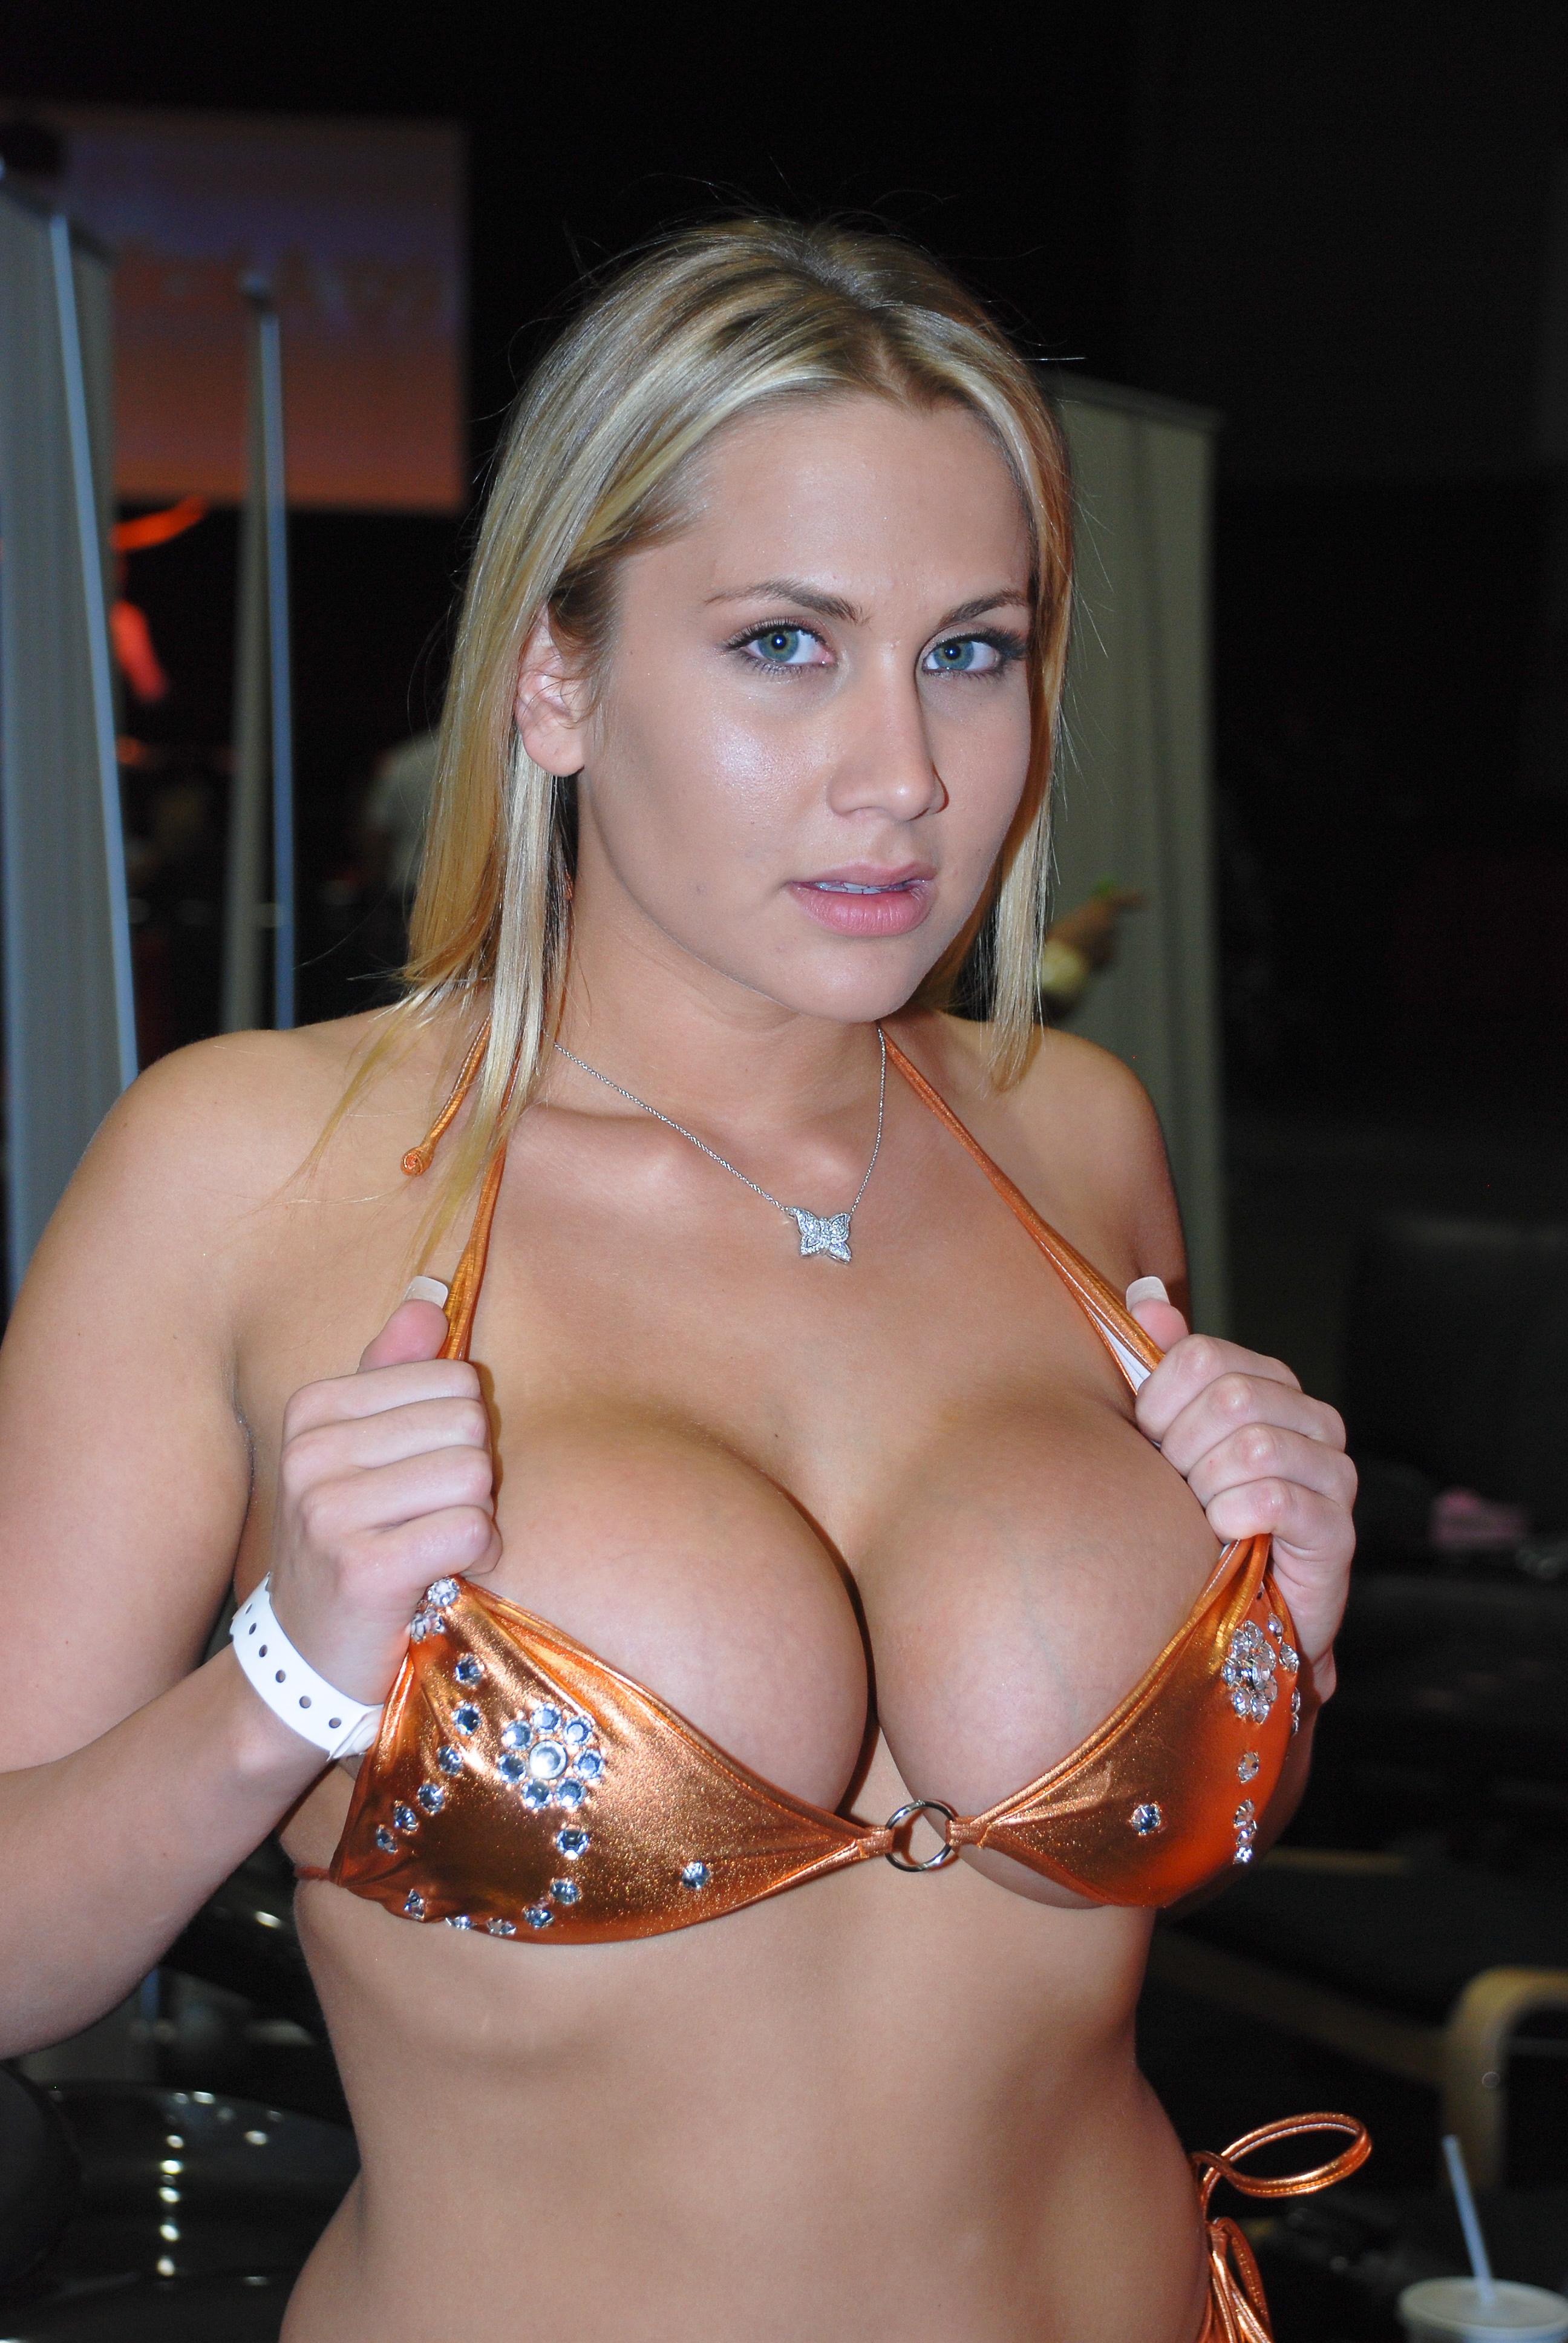 Alanah Rae Videos Porno alanah rae - busty blonde female porn star & glamour model